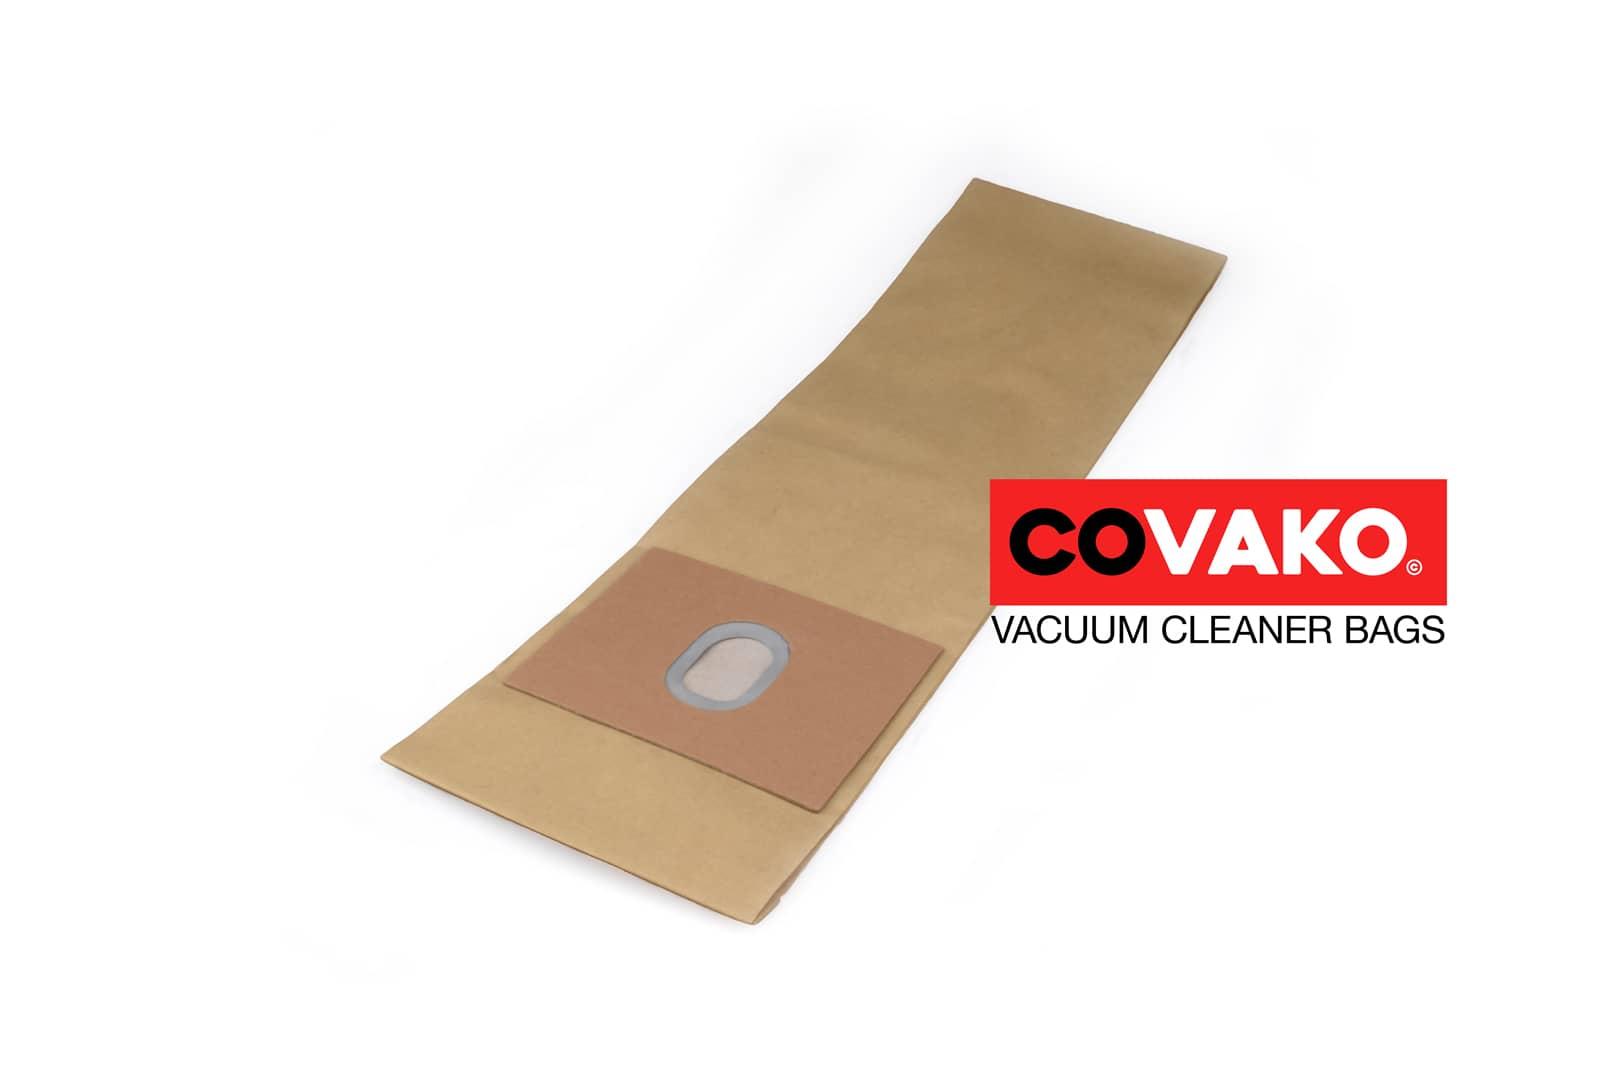 Nilco 171 / Paper - Nilco vacuum cleaner bags